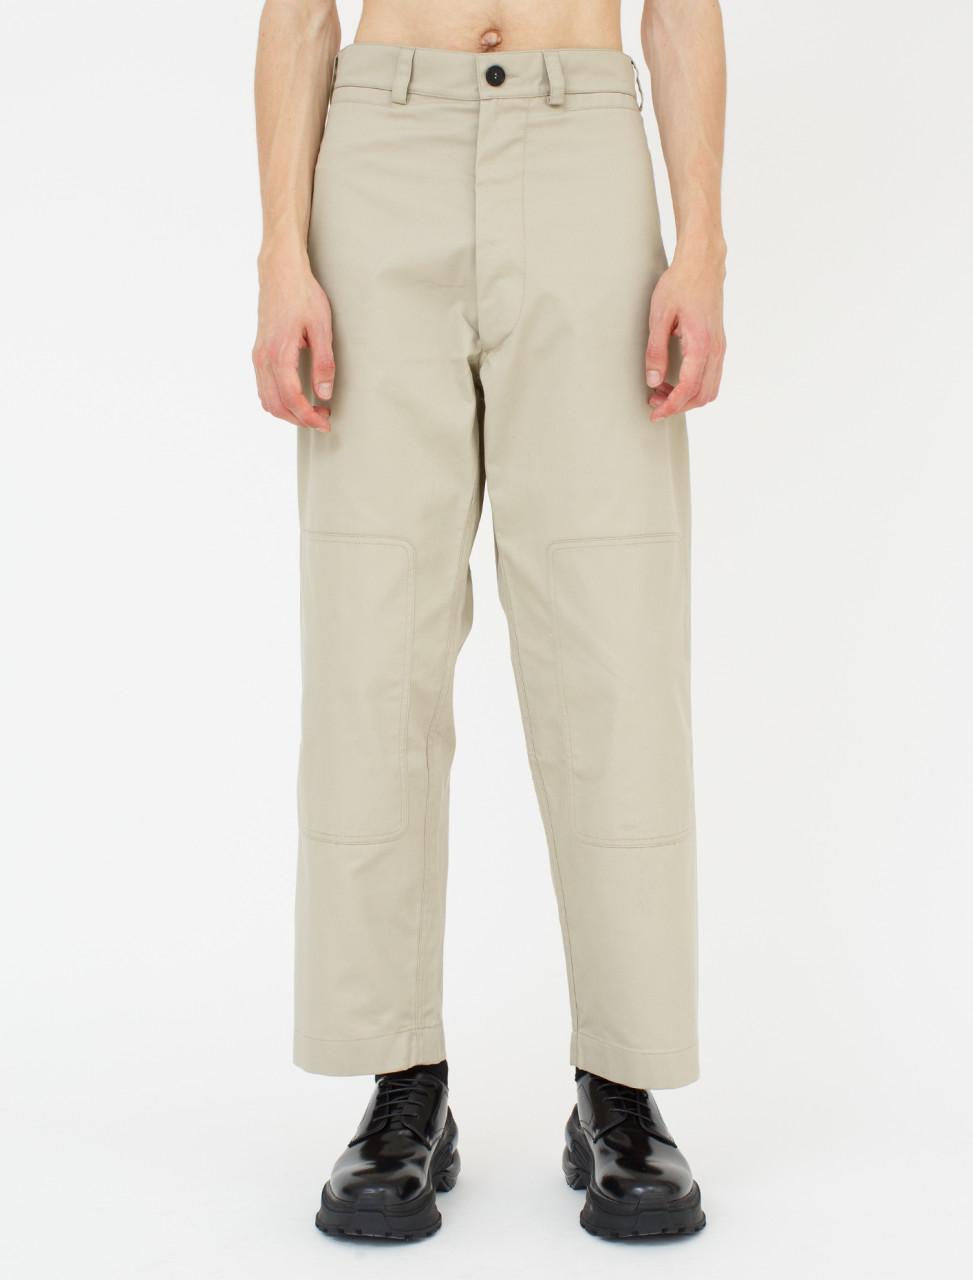 Le Pantalon Peintre